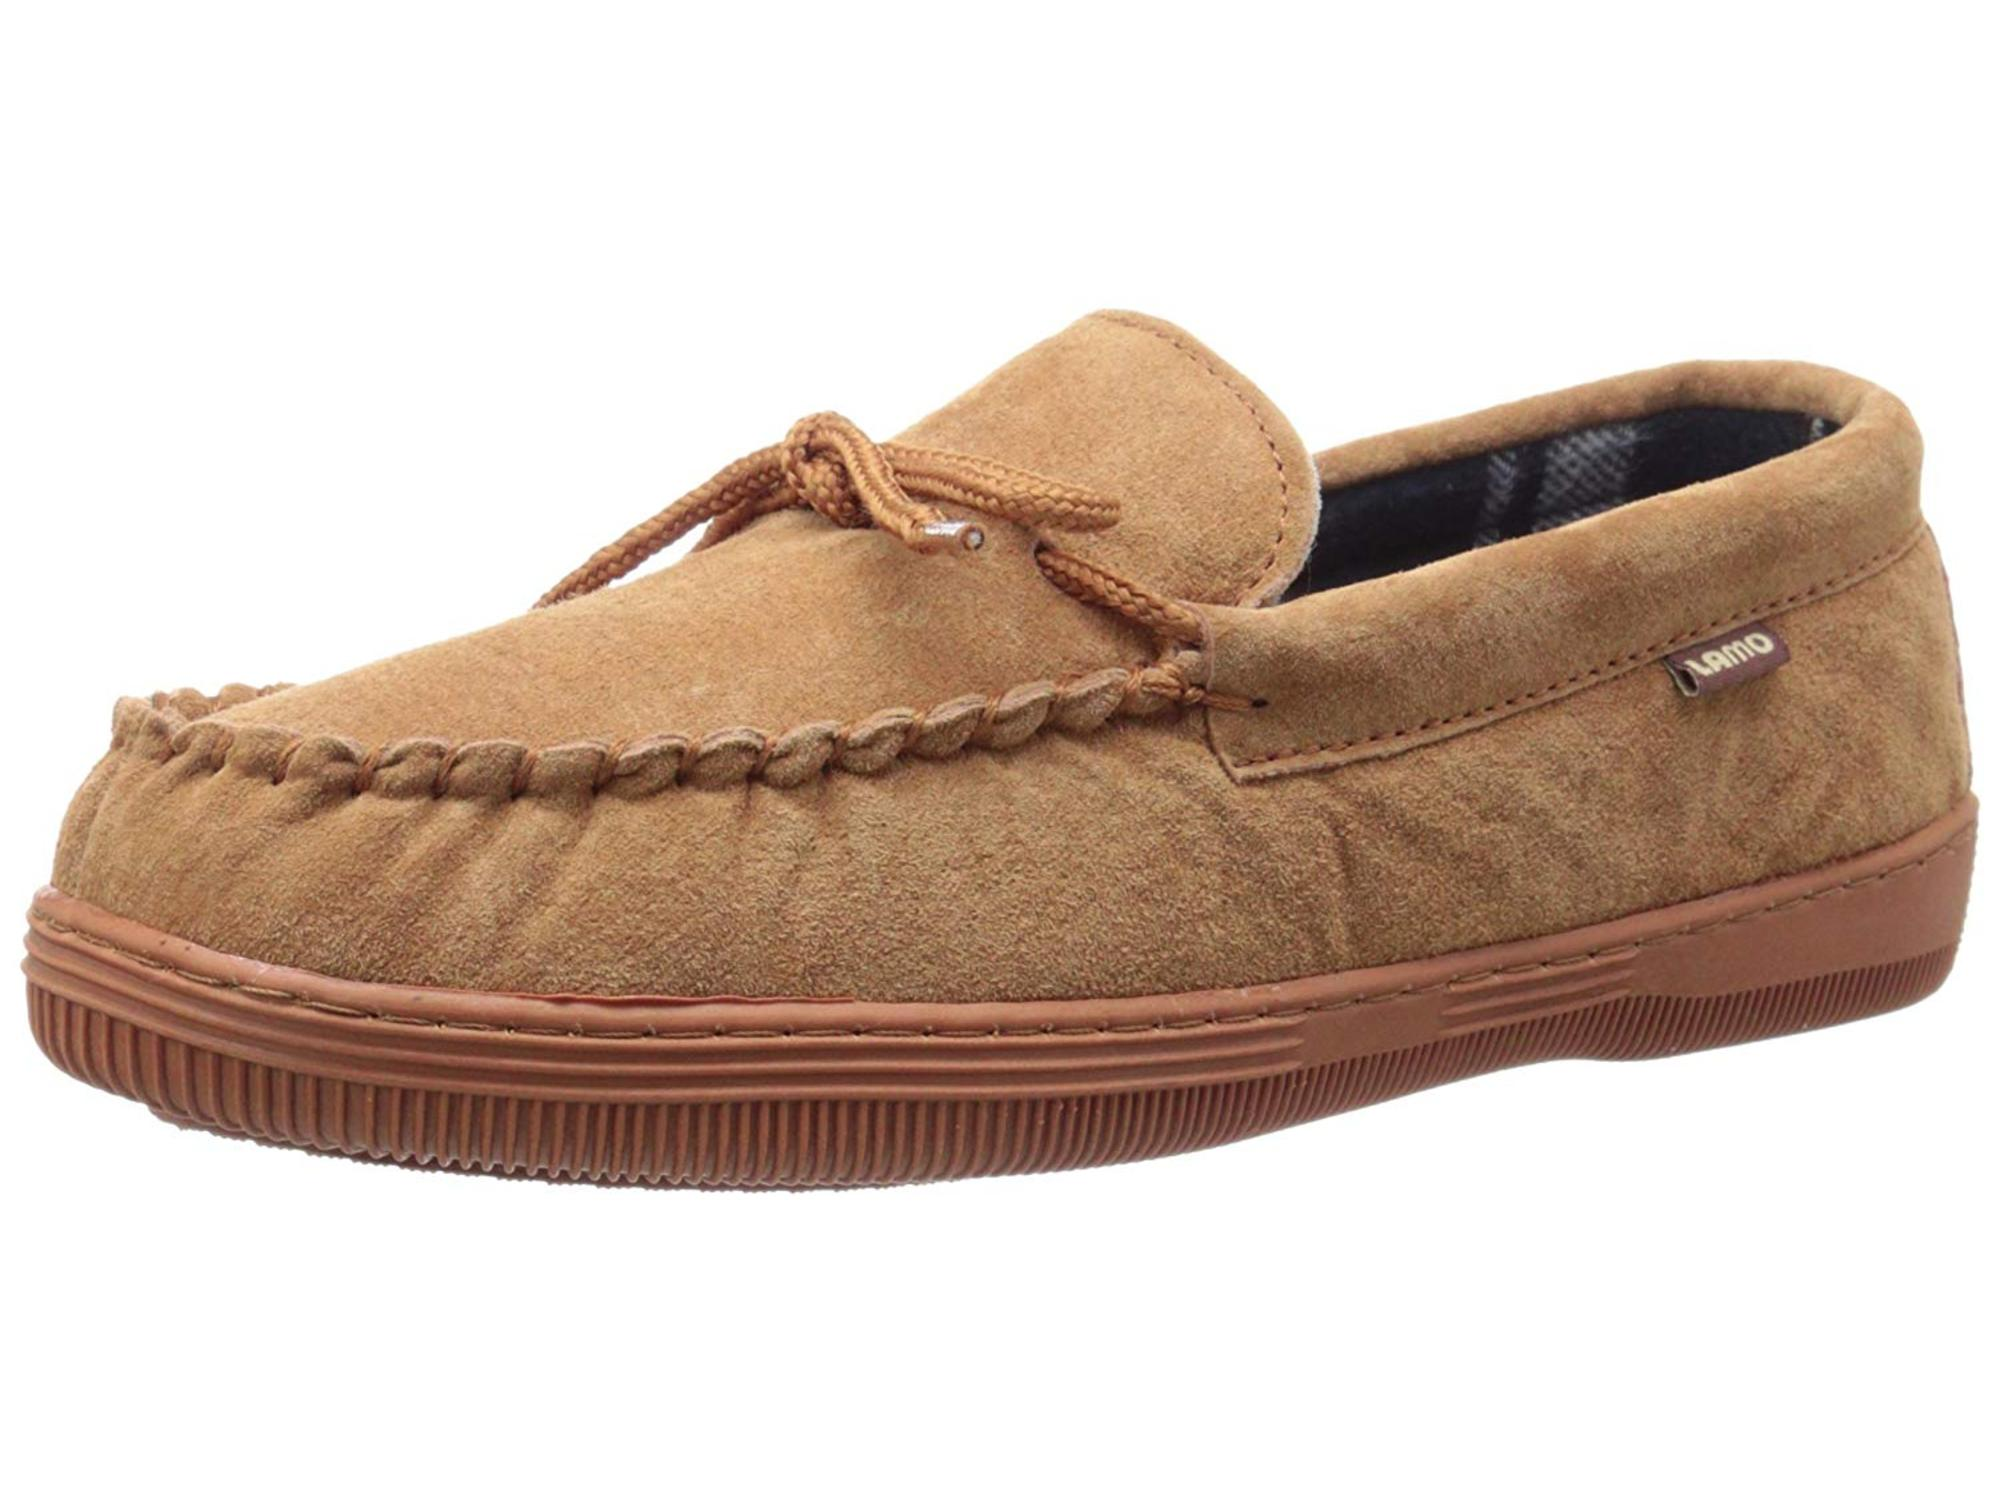 Lamo Men's Plaid Moccasins Slip-On Loafer, Chocolate, Size 8.0 by Lamo